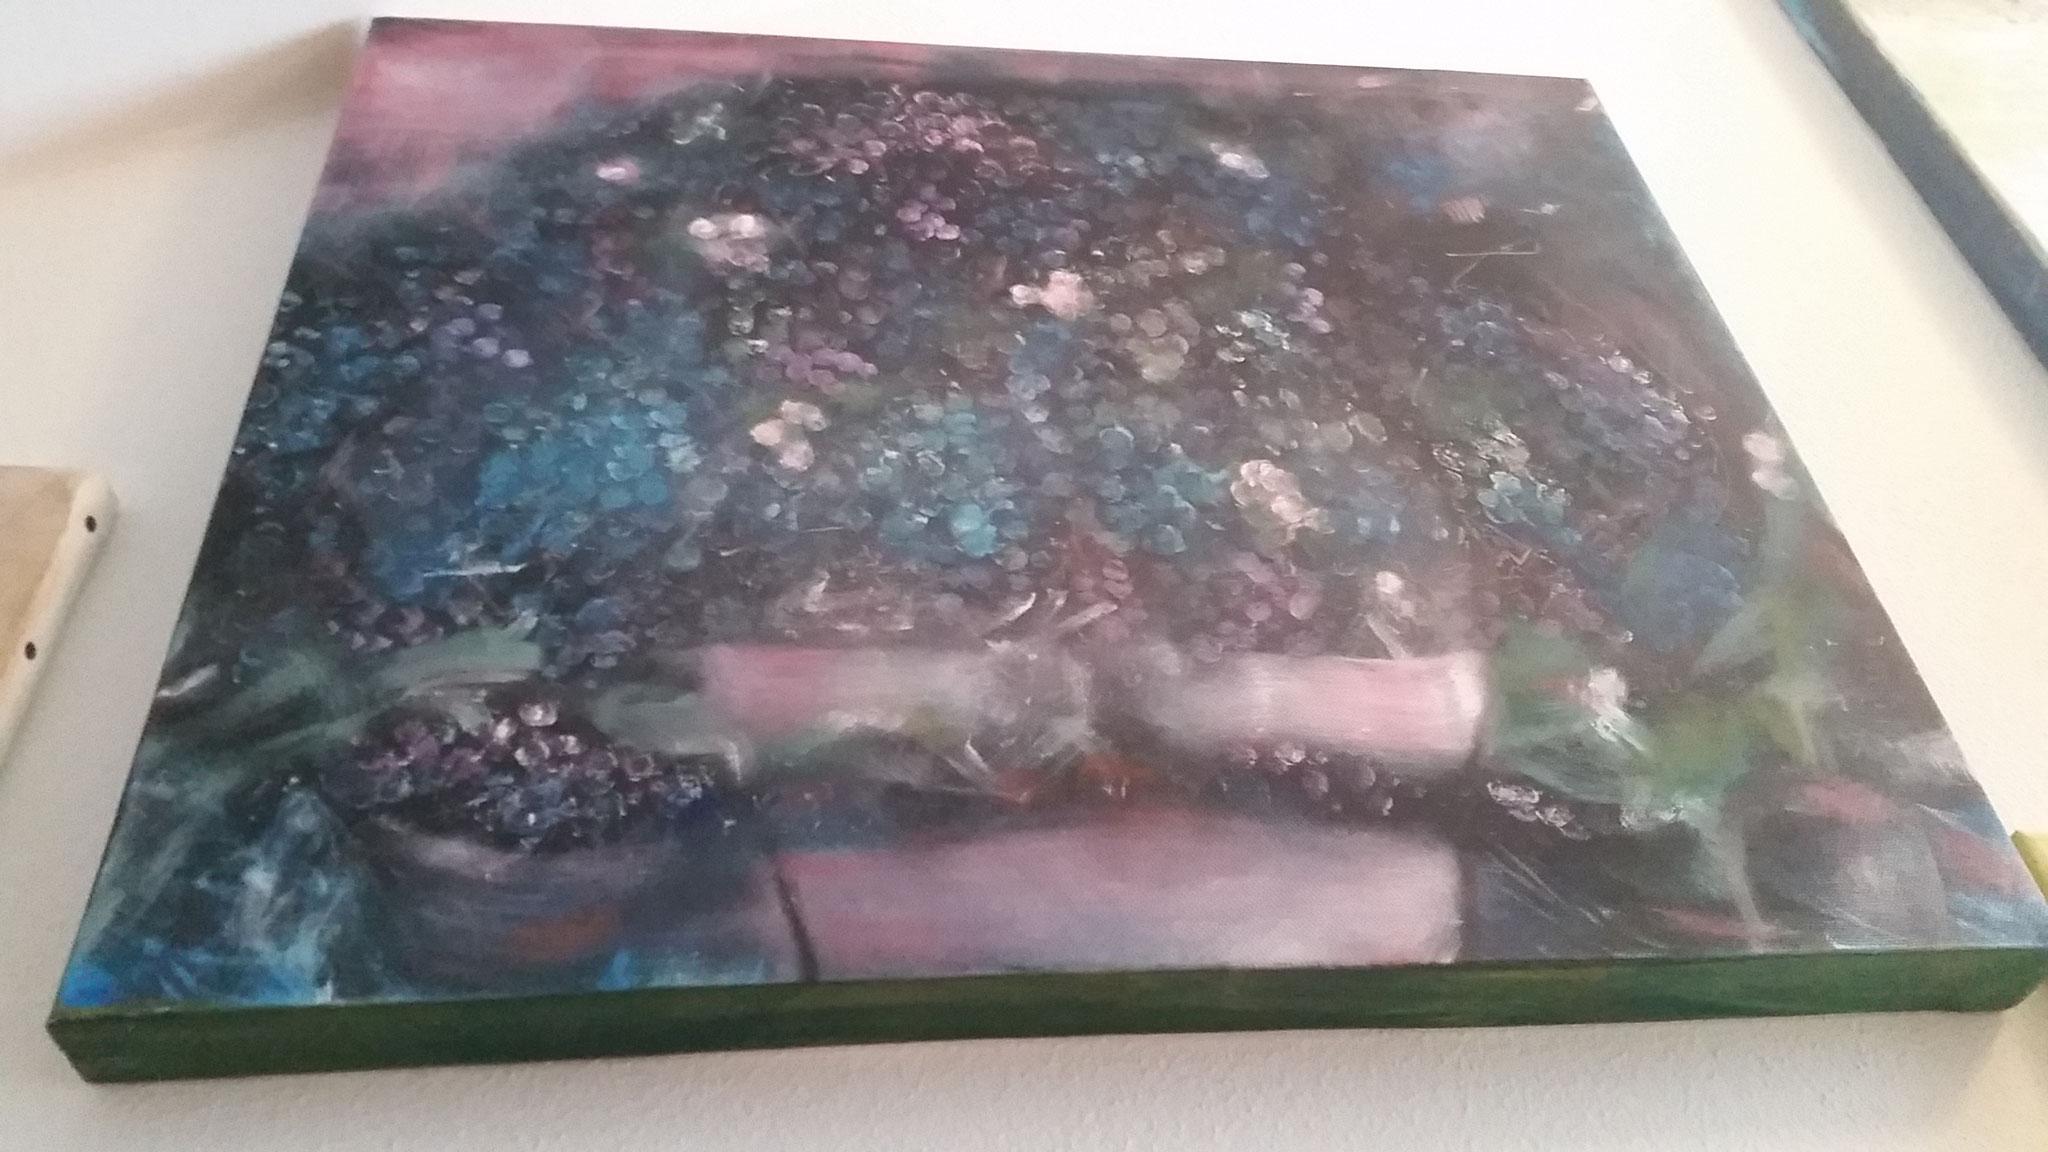 Treppen-Galerie 19, Maler Künstlerin Bozana